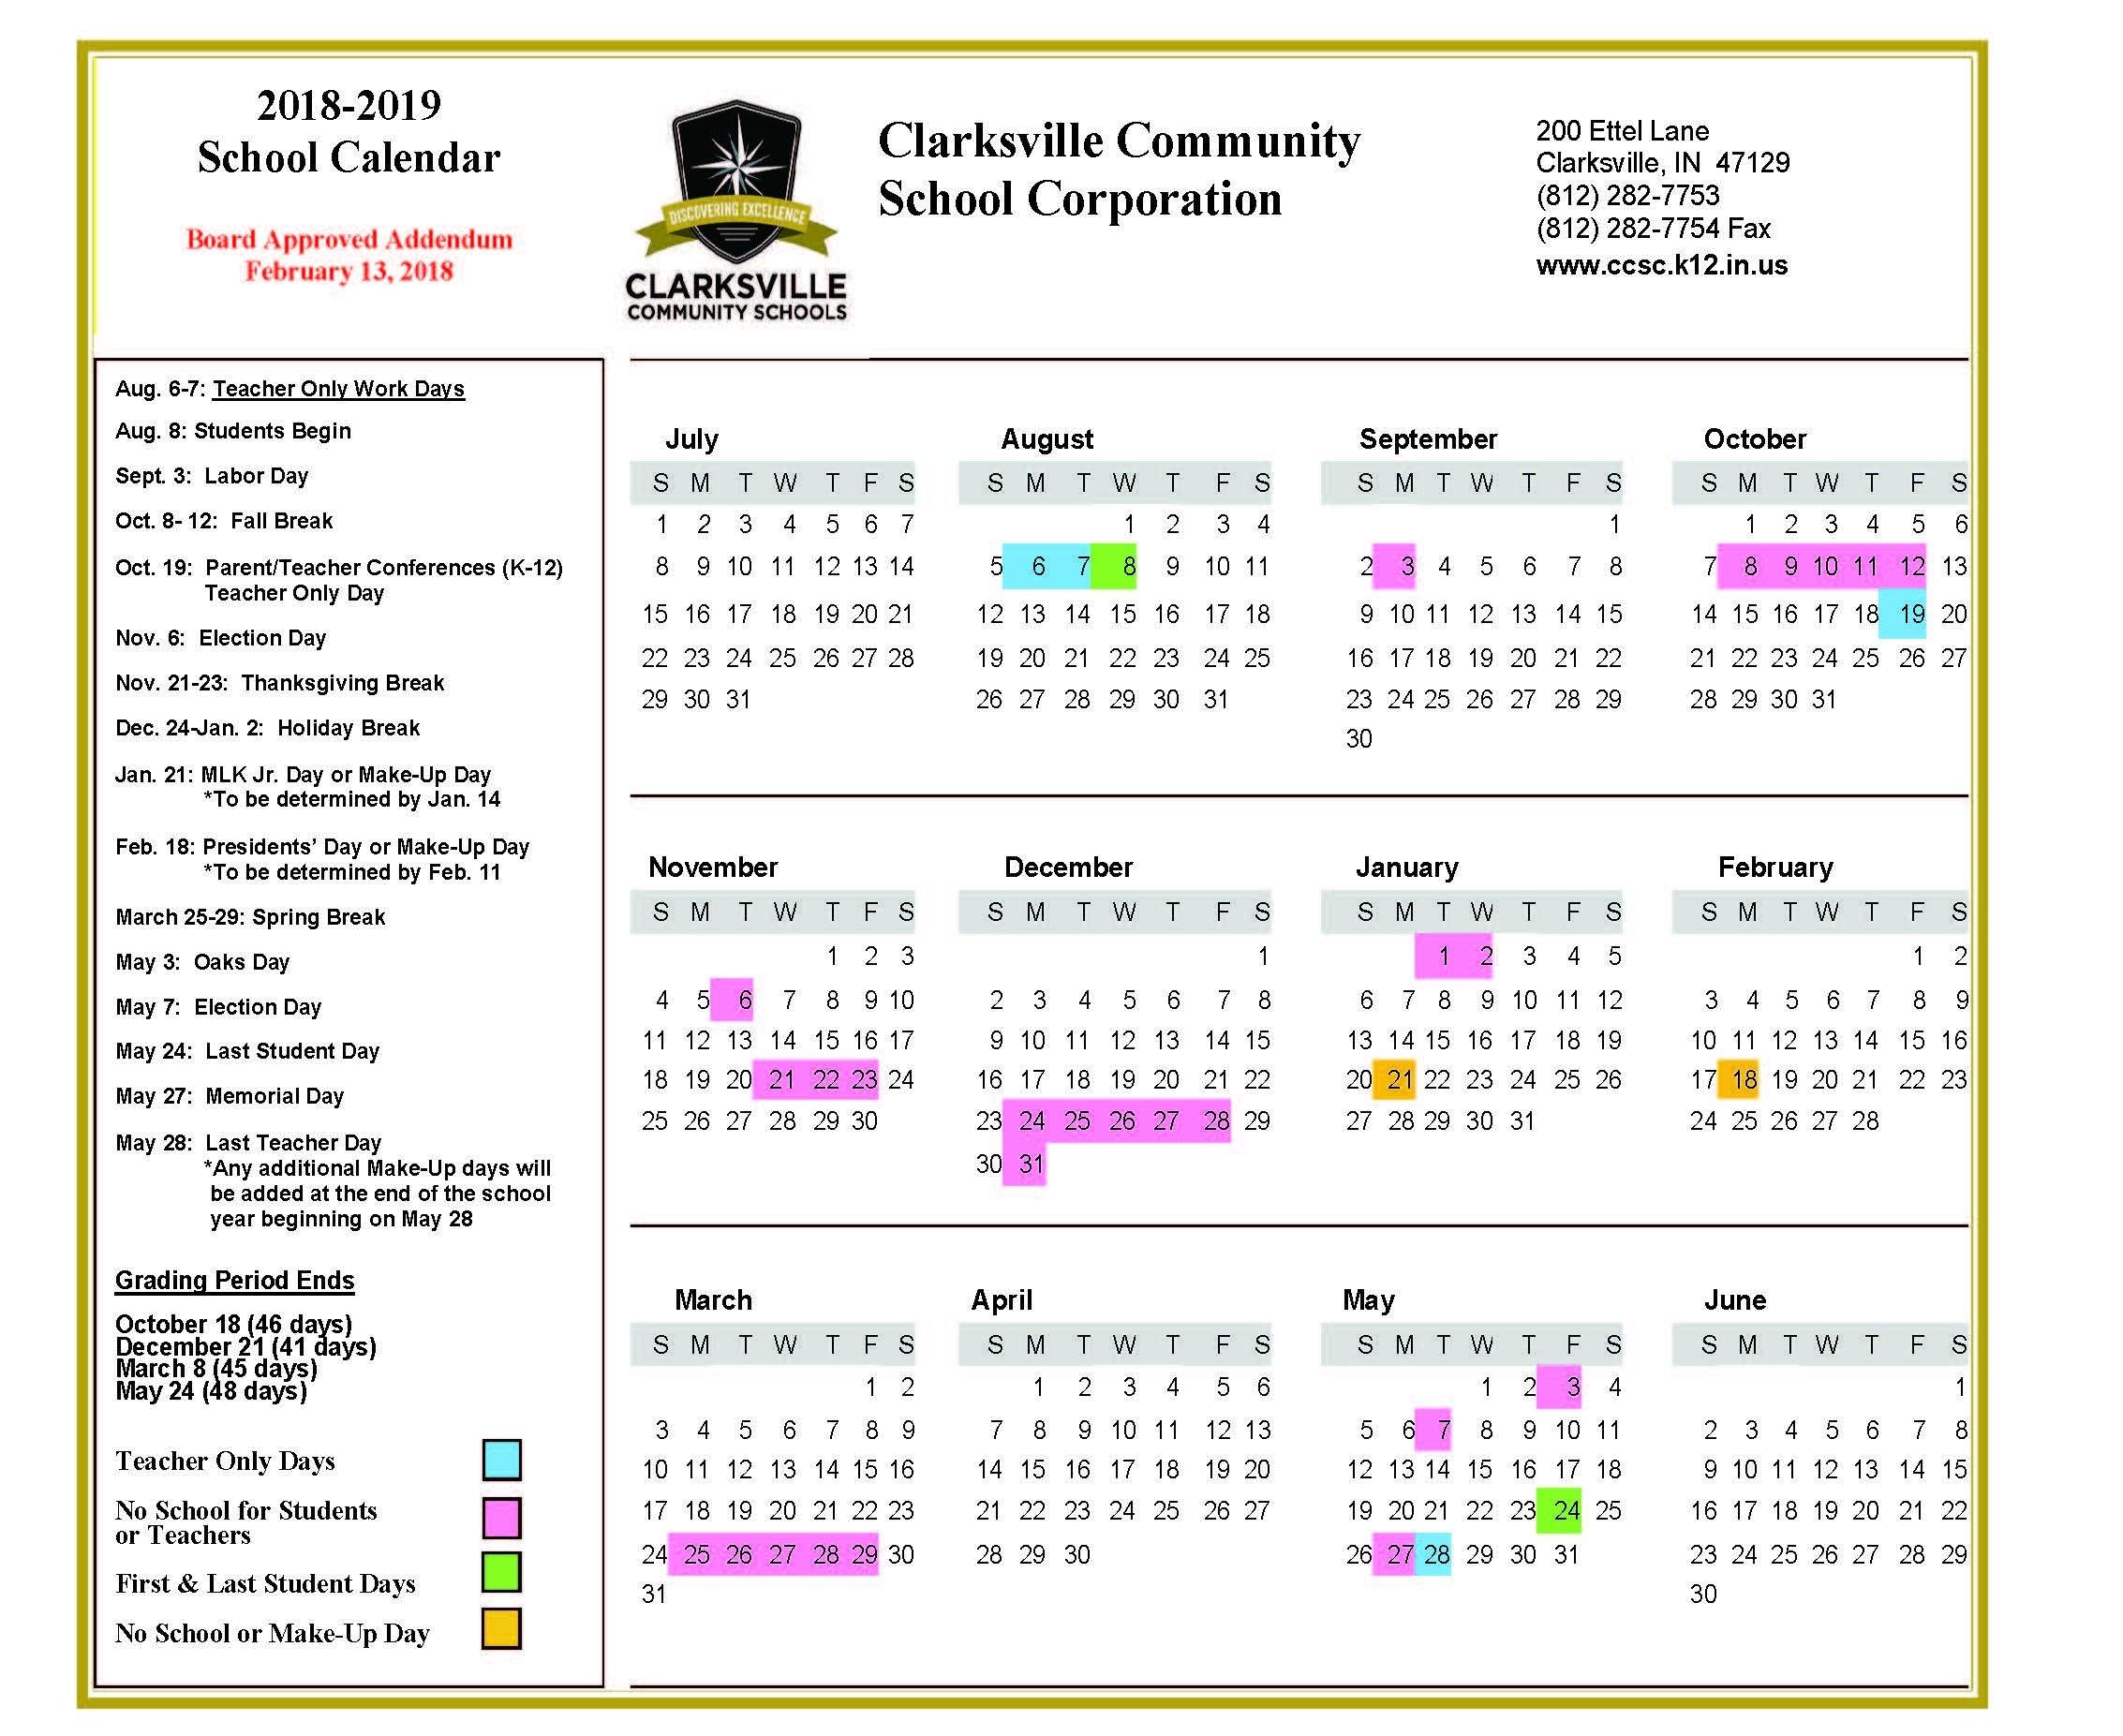 2018-2019 School Calendar Approvedboard | Clarksville Community Calendar 2019 School